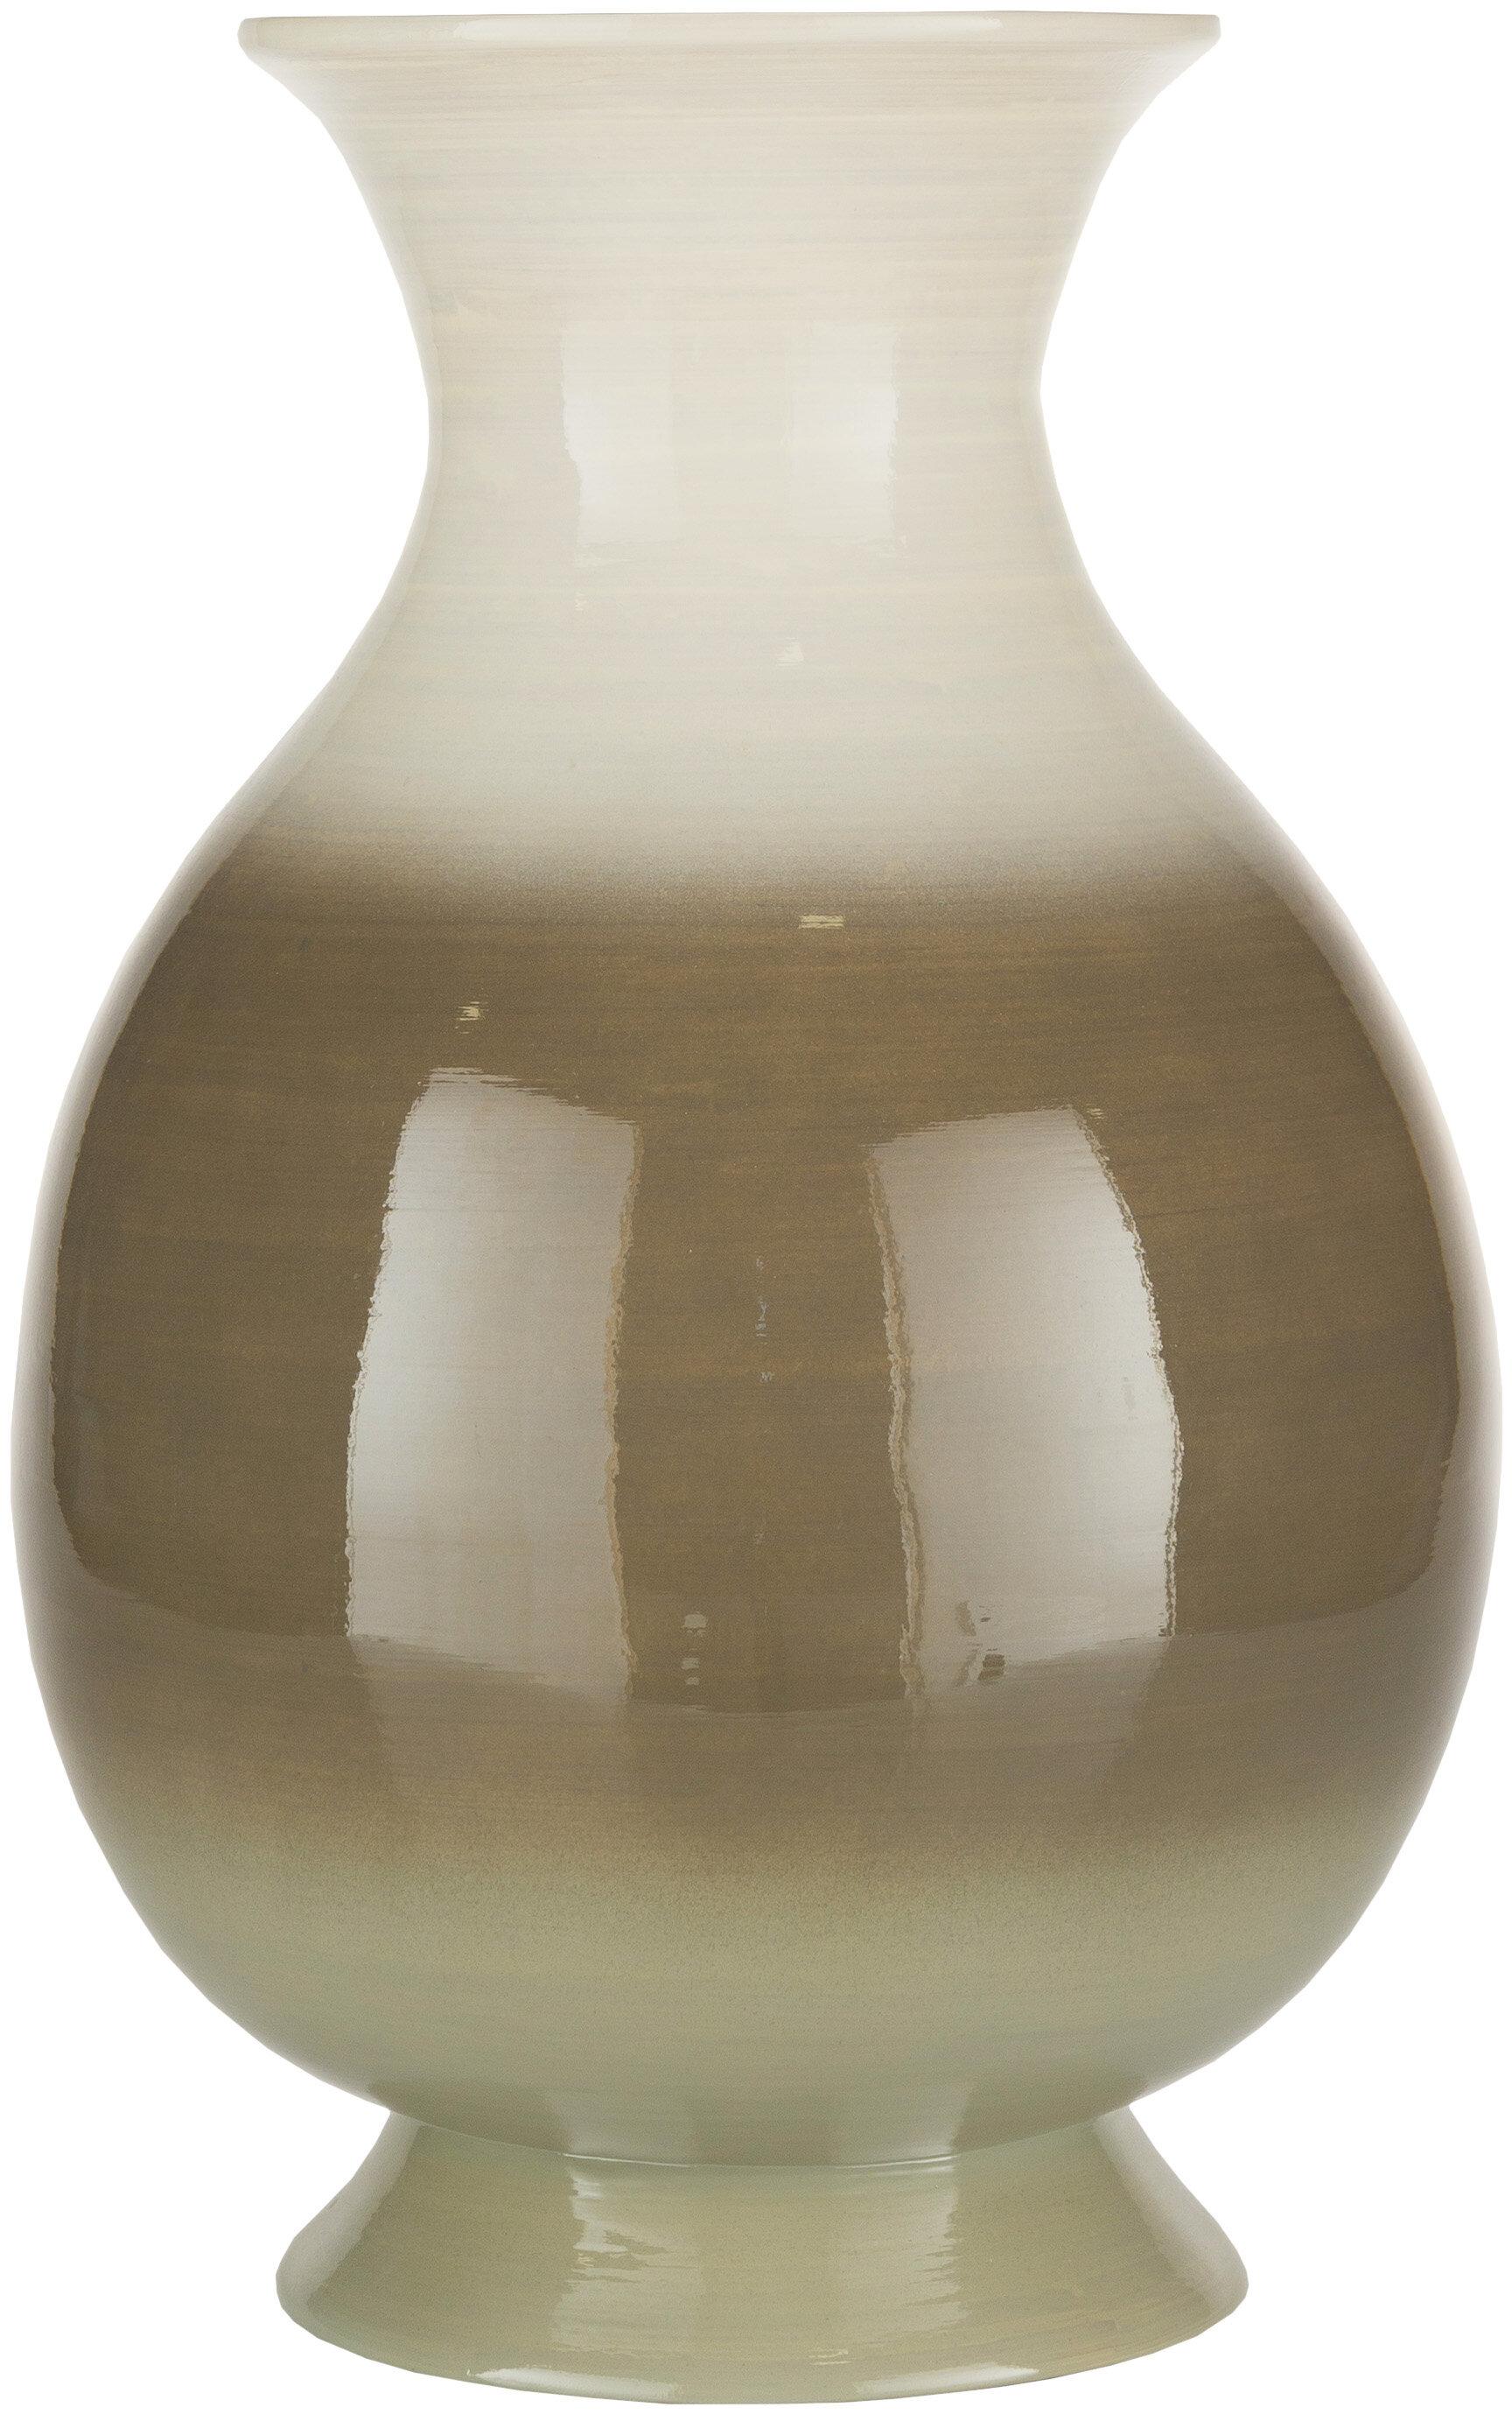 Brayden Studio Mackenzie White Camel 16 5 Wood Table Vase Wayfair